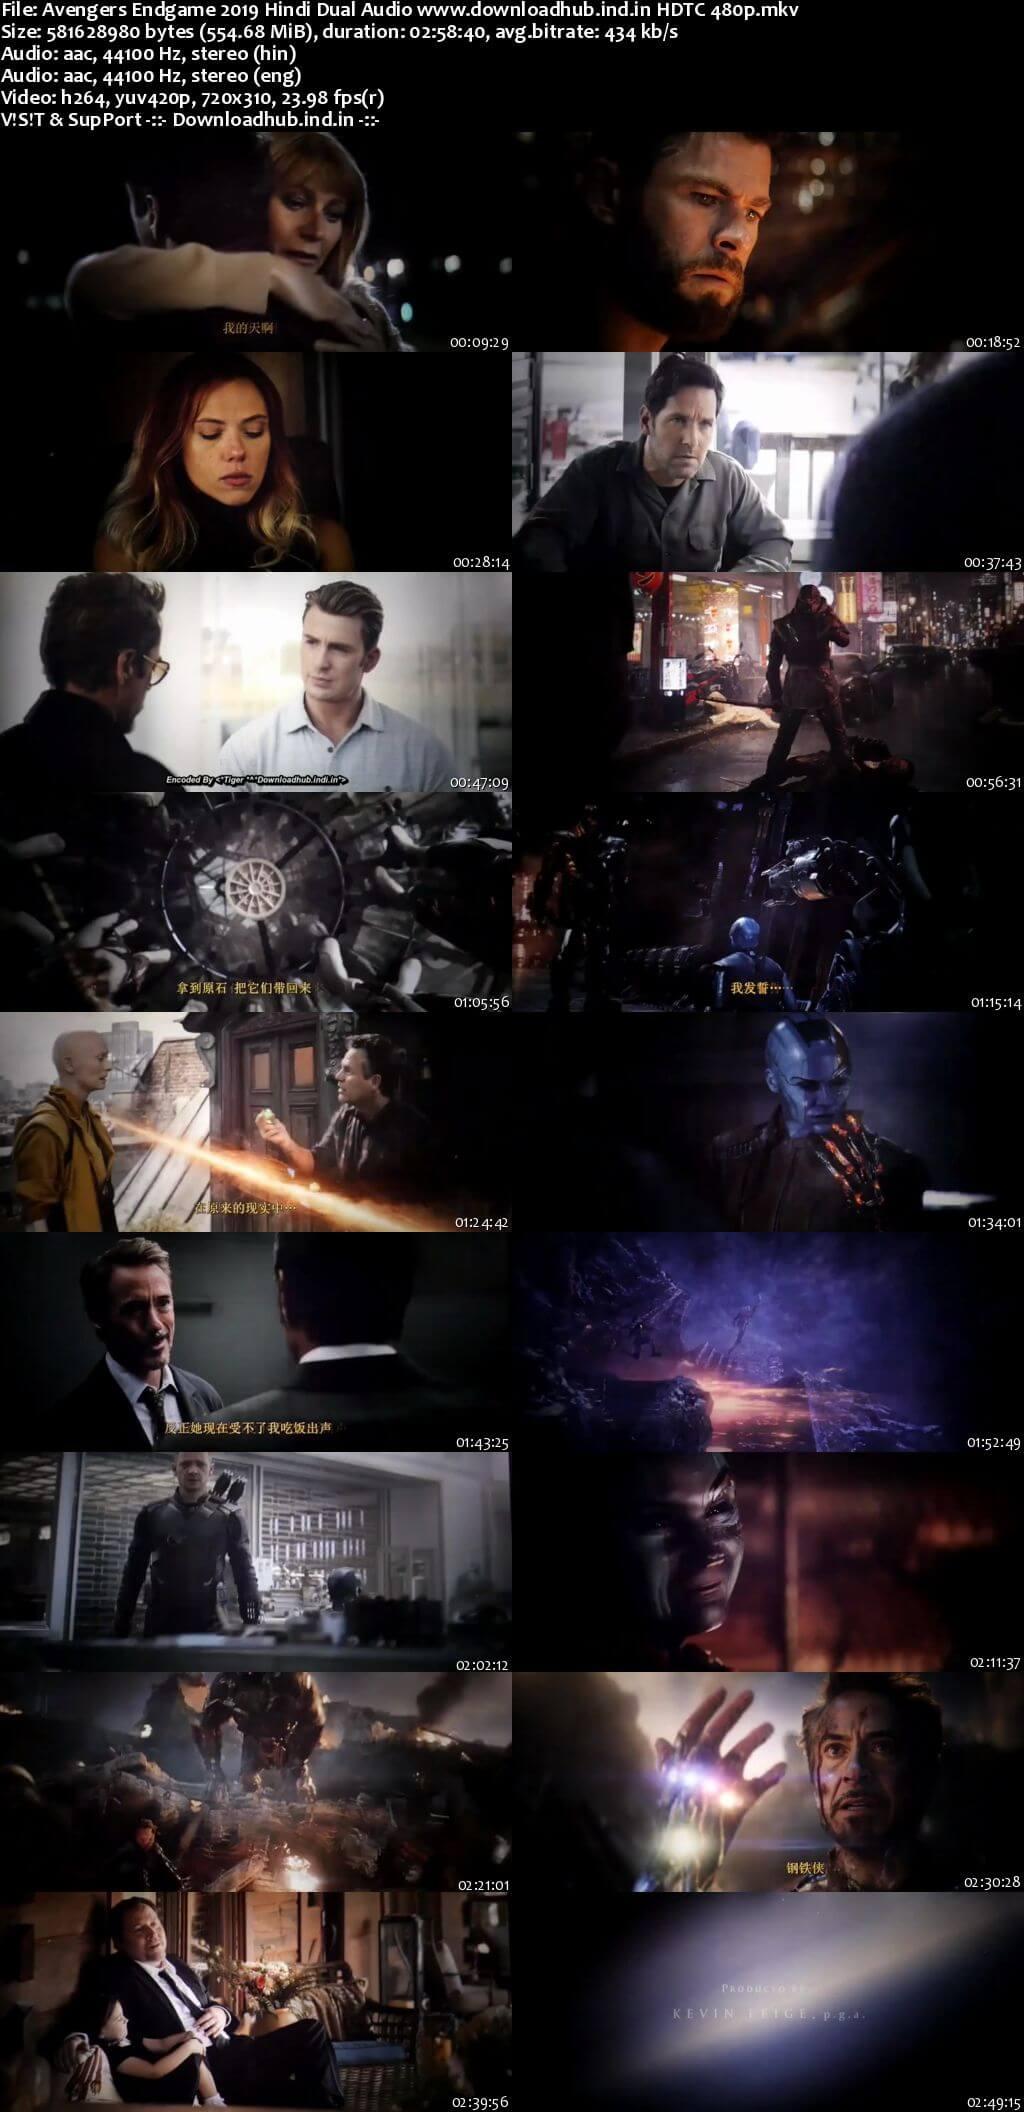 Avengers Endgame 2019 Hindi Dubbed Dual Audio 550MB HDTC 480p